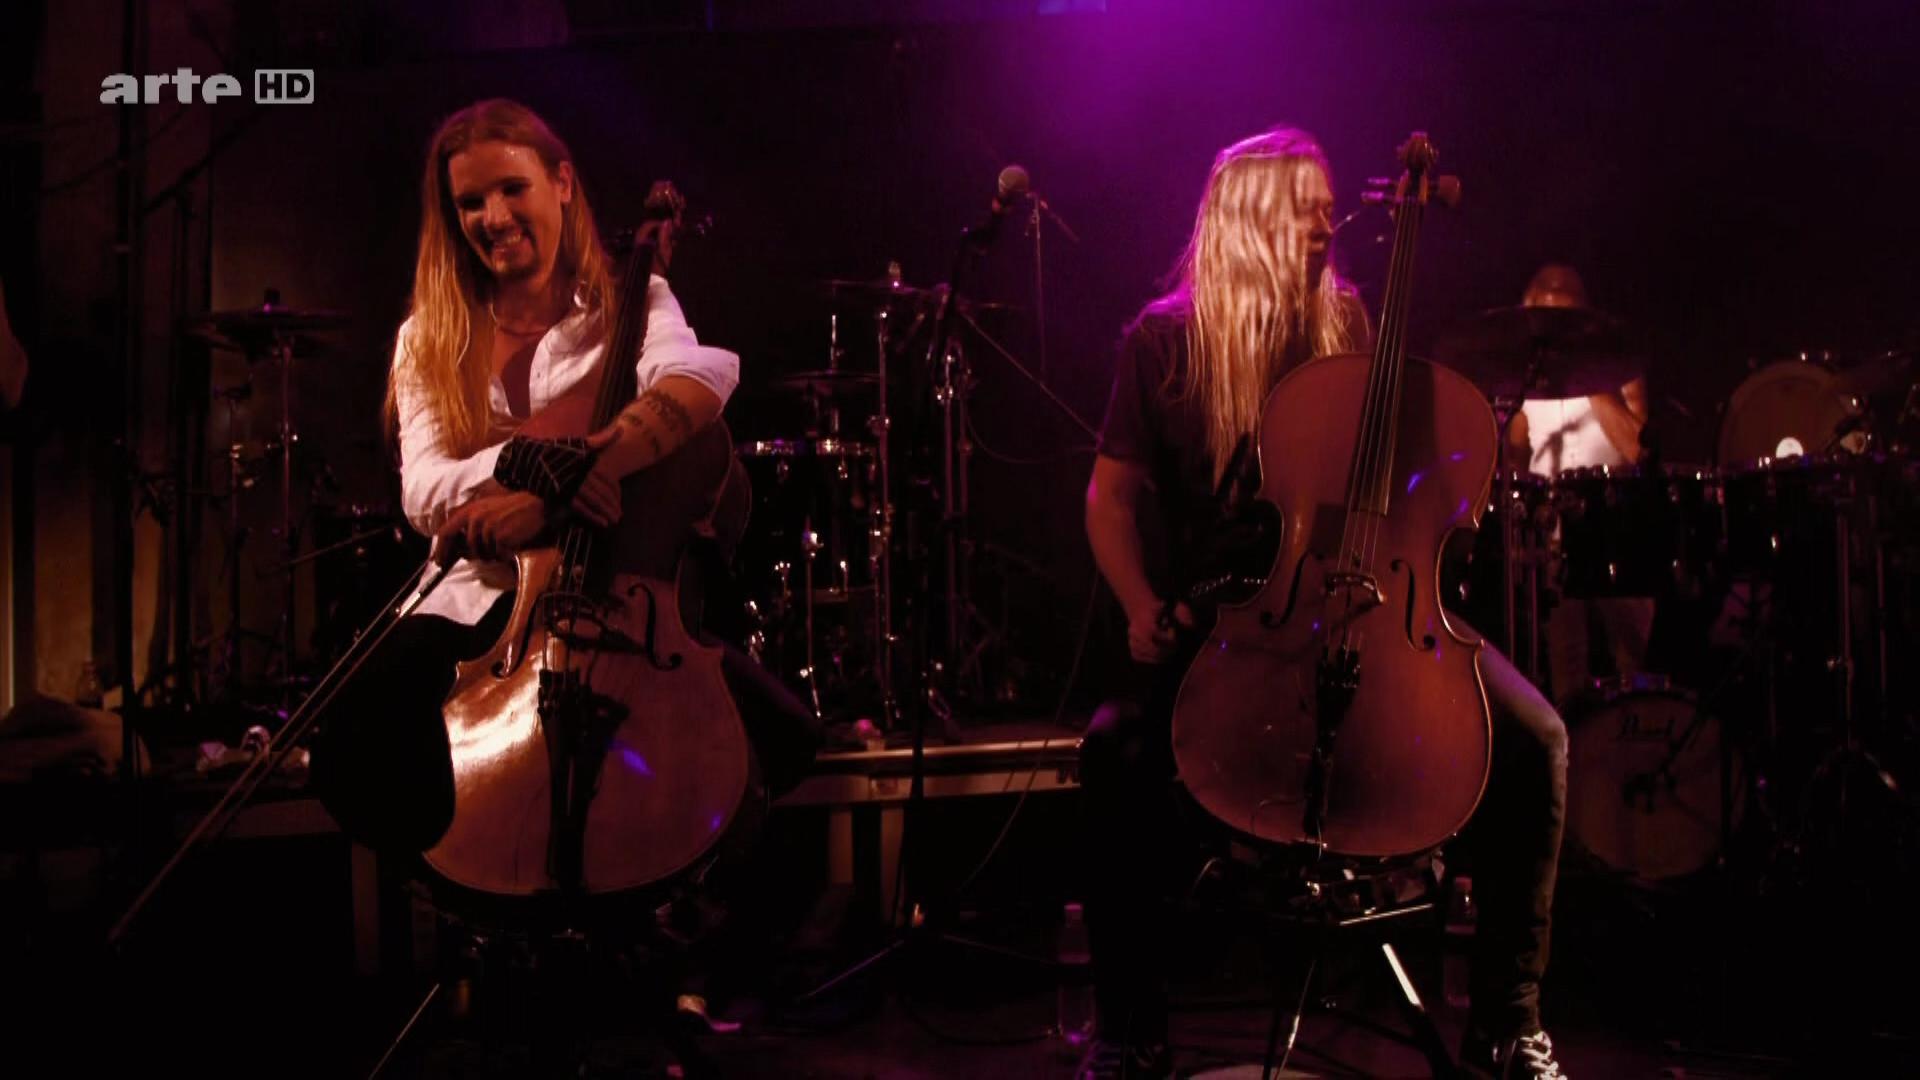 Apocalyptica - Berlin Live (2015) HDTV 1080i